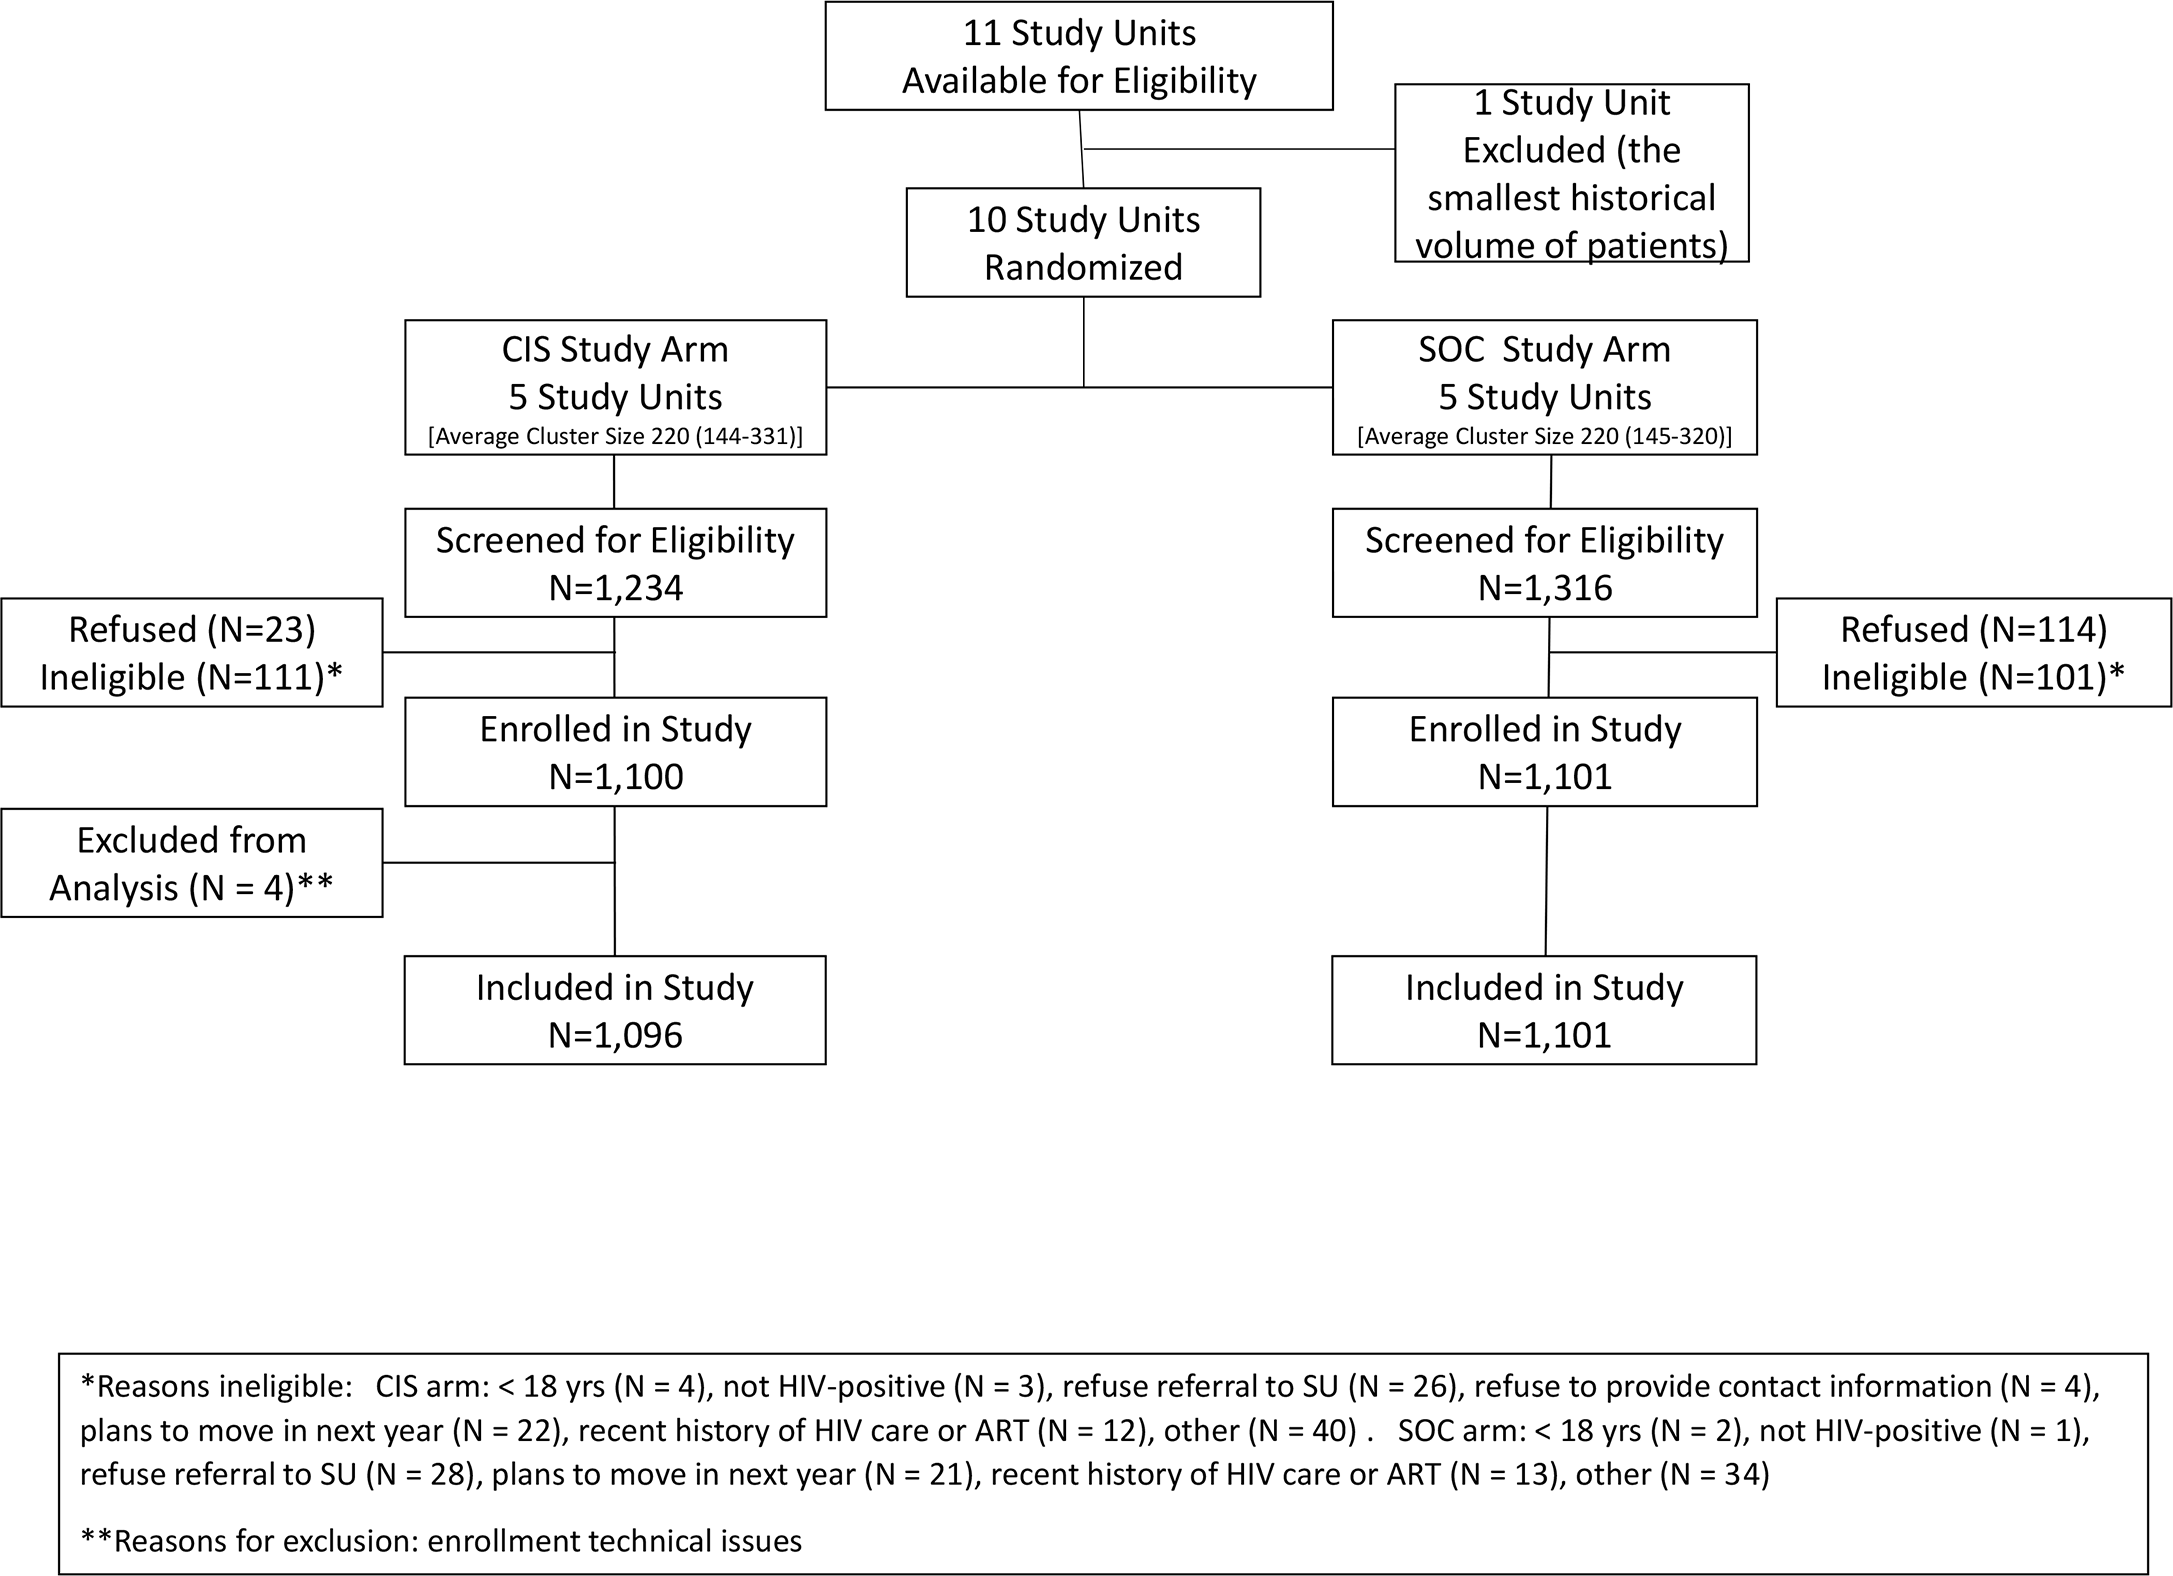 Flow diagram of study enrollment.